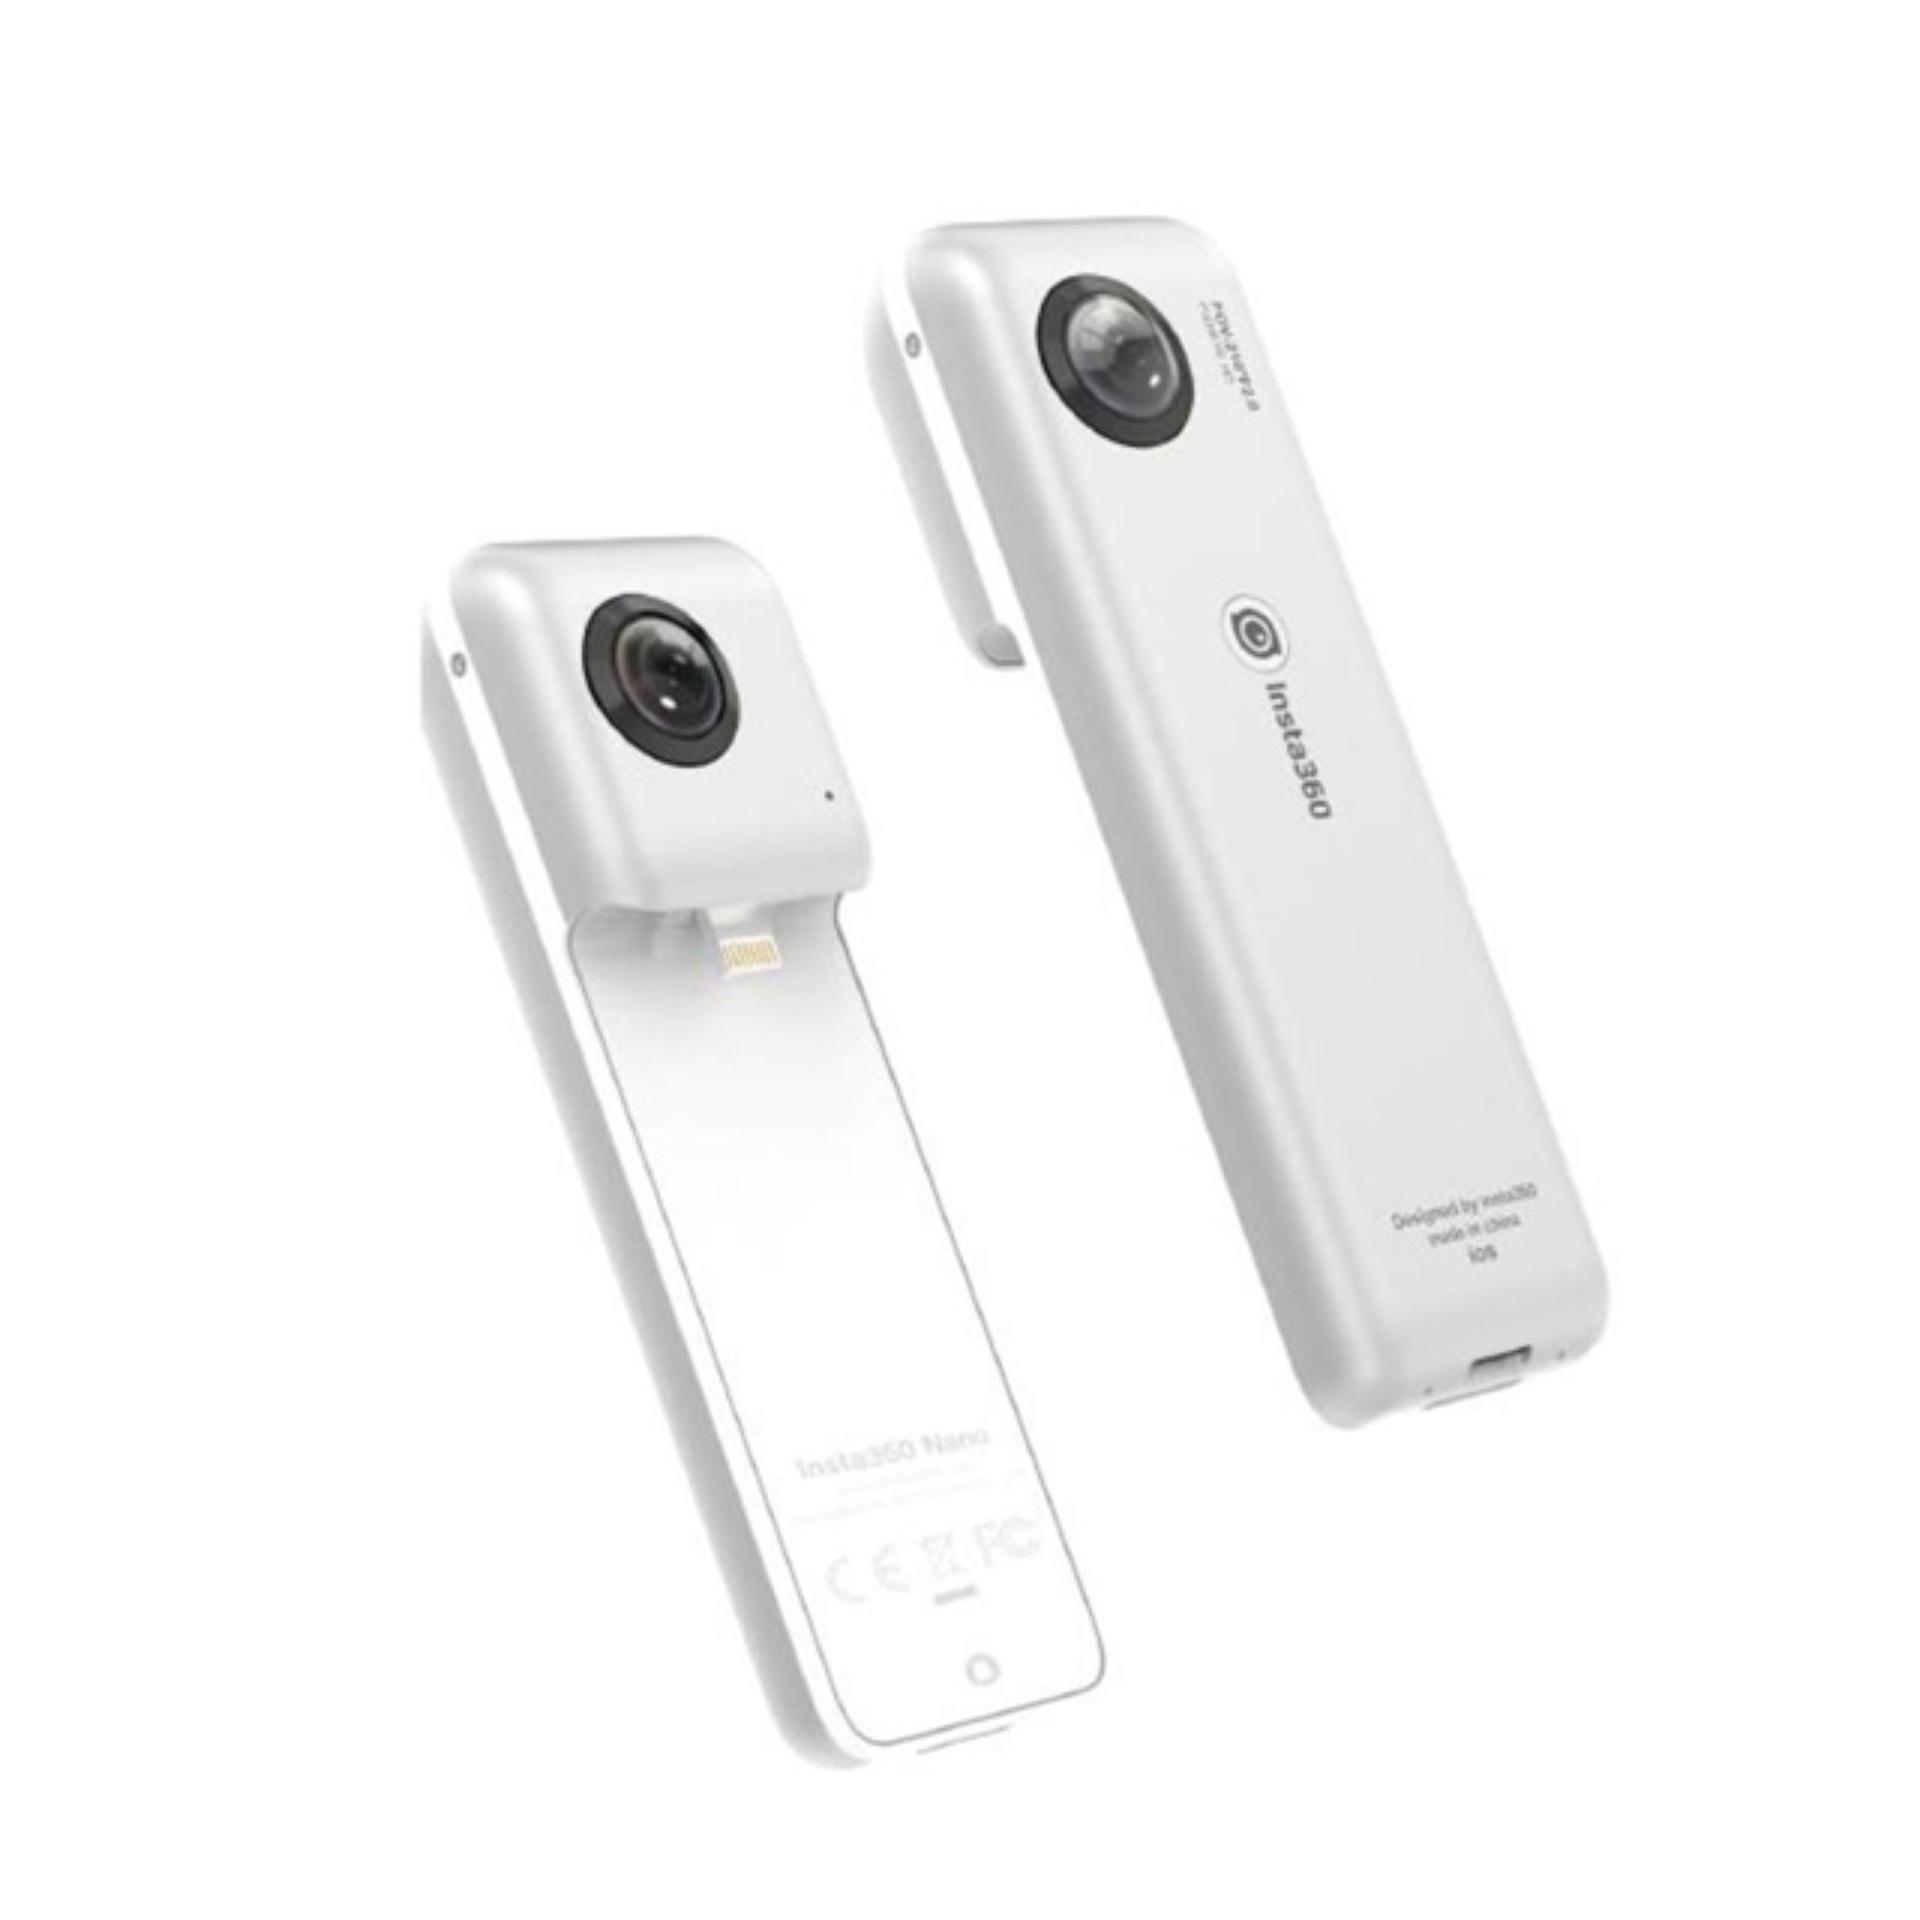 Insta360 Nano 360 degree VR Camera for iPhone and more